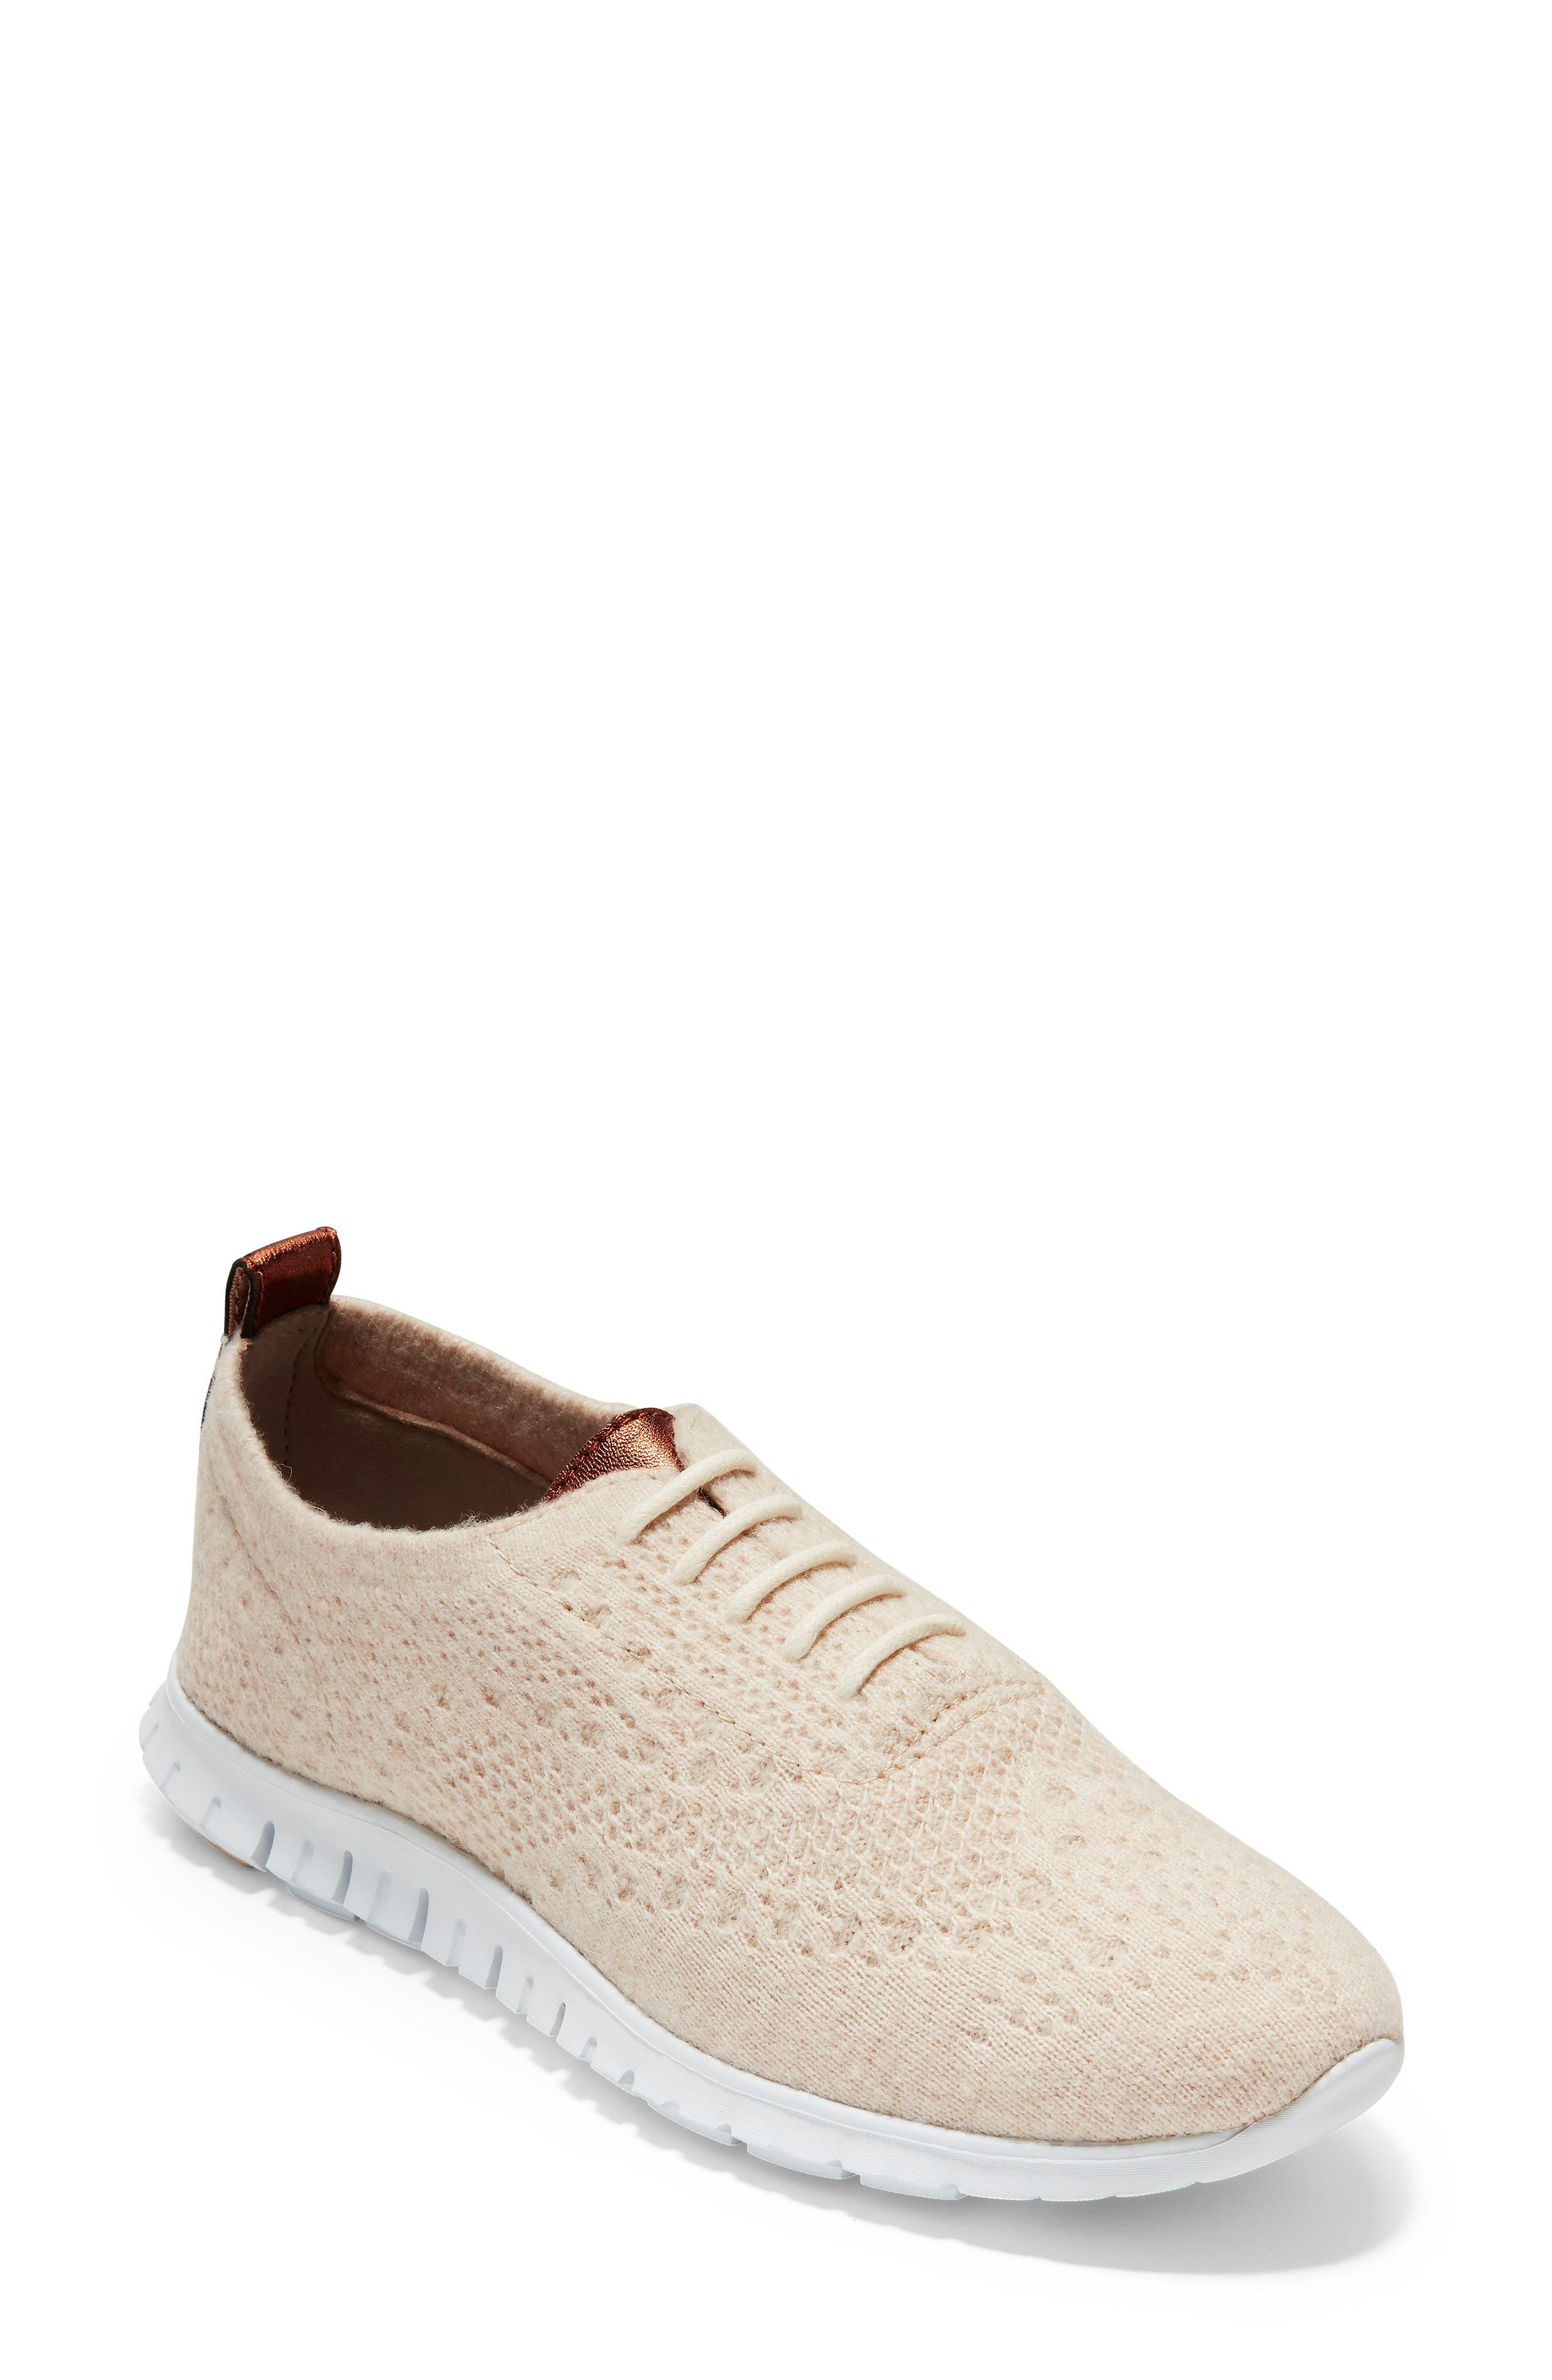 Women's Sneakersamp; ShoesNordstrom Beige Sneakersamp; Women's Running Beige Yb7f6yg